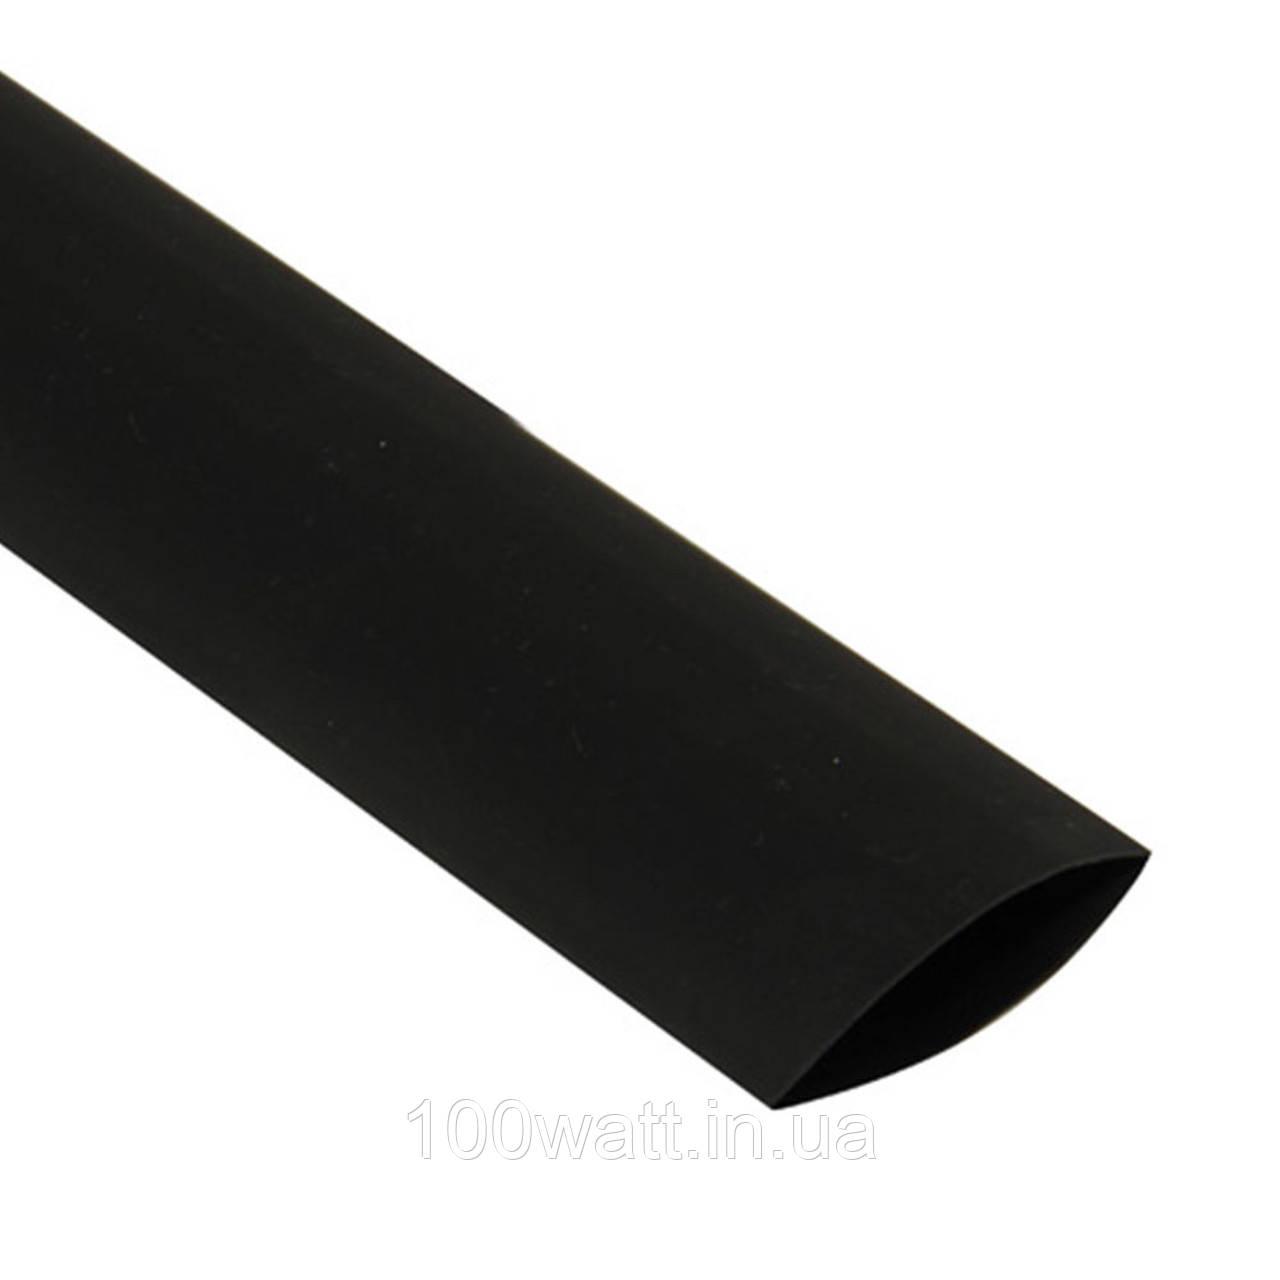 Трубка термоусадочная c клеем 7,9/2,6 мм, чёрная (1м) GAV 365-7,9